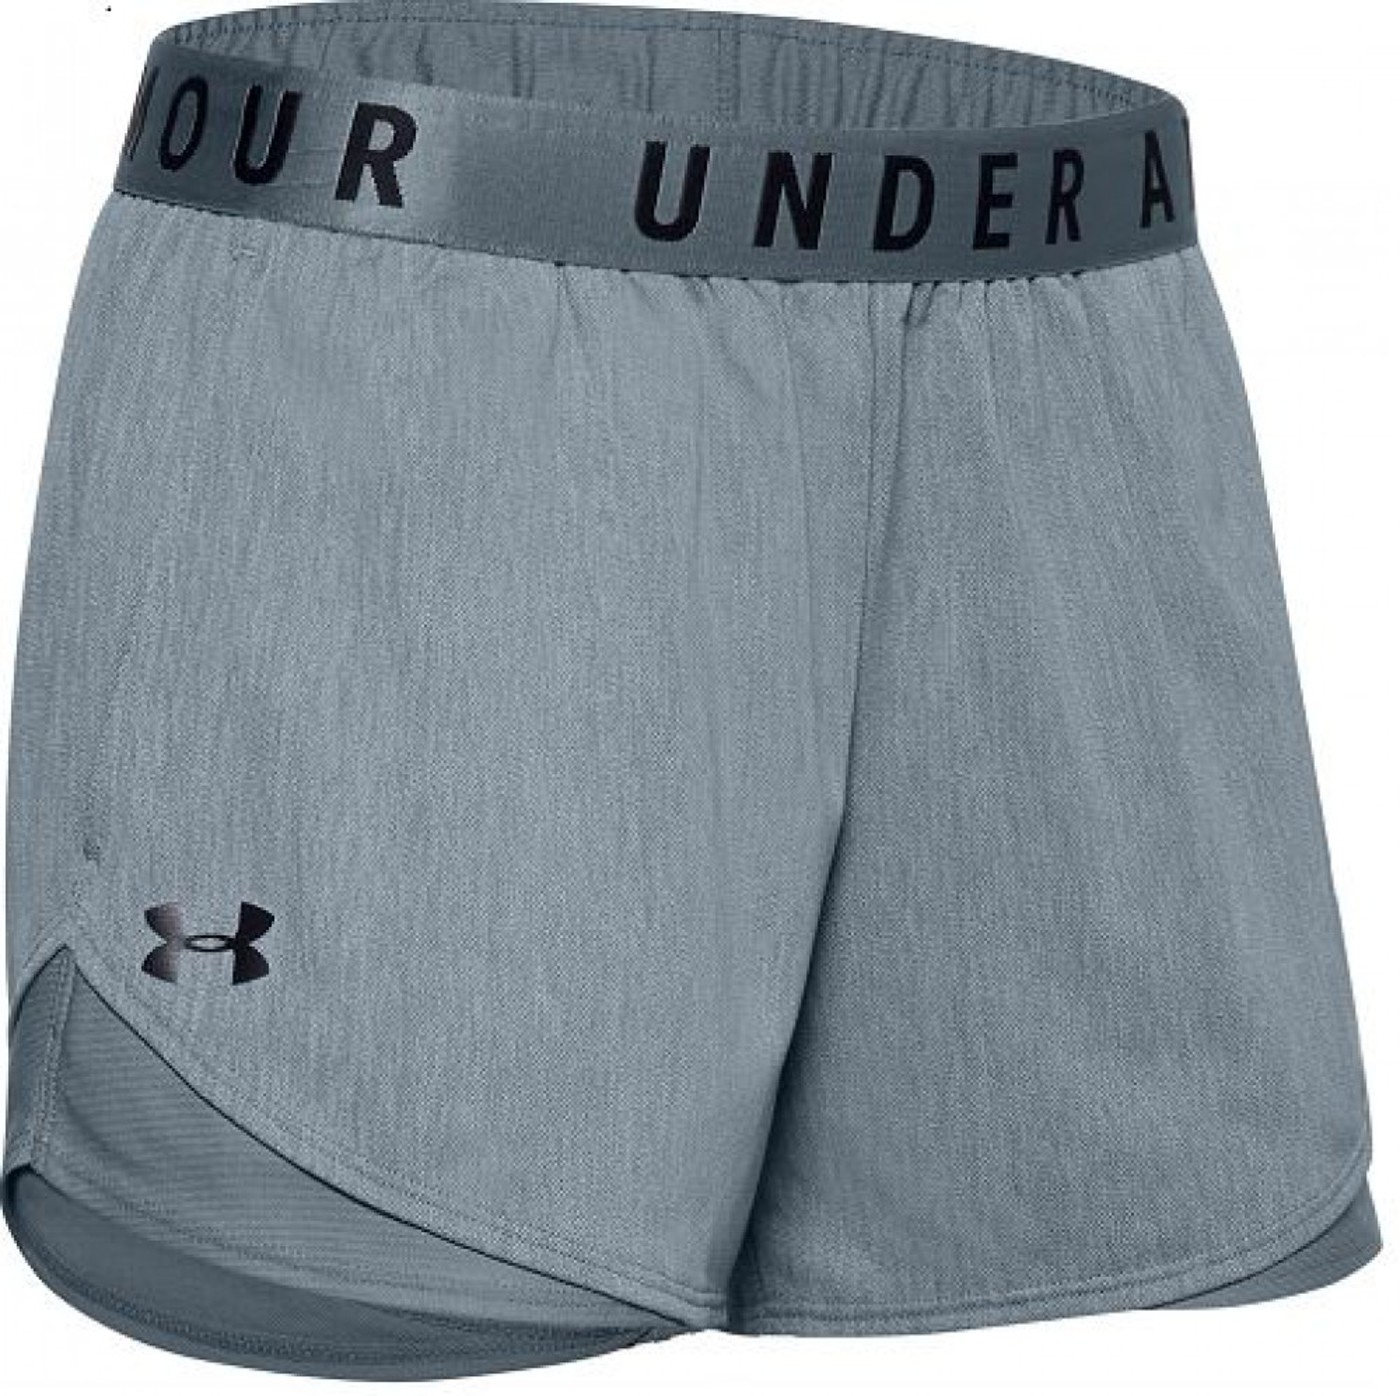 UNDER ARMOUR Play Up Twist Shorts 3.0 - Damen